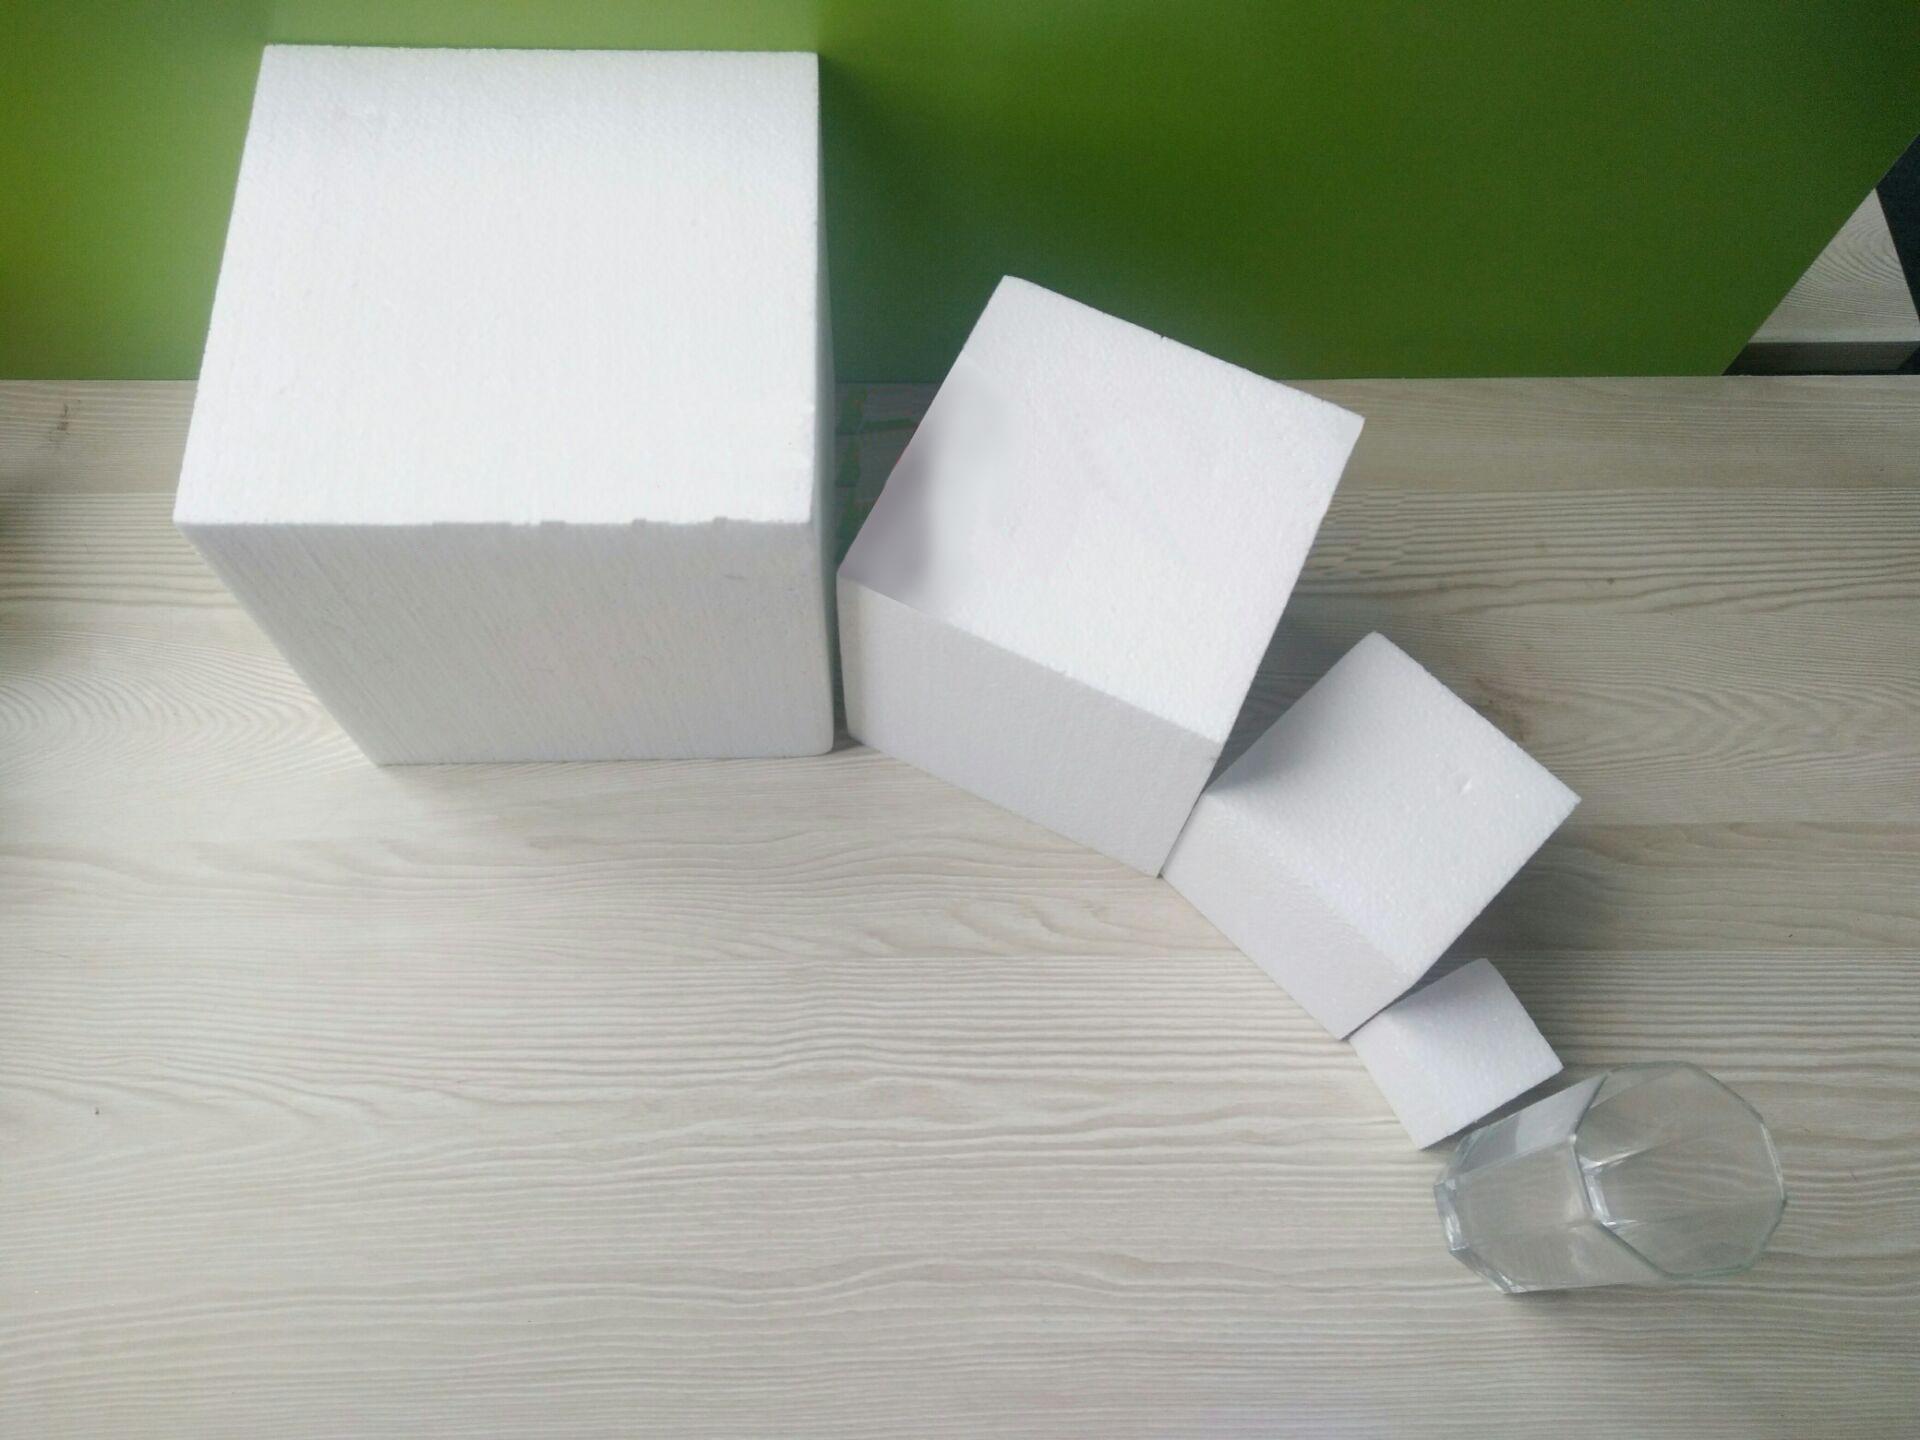 Polystyrene Styrofoam Foam Cube Educational Tools /toys Children/kids DIY Handmade Materials Many Sizes